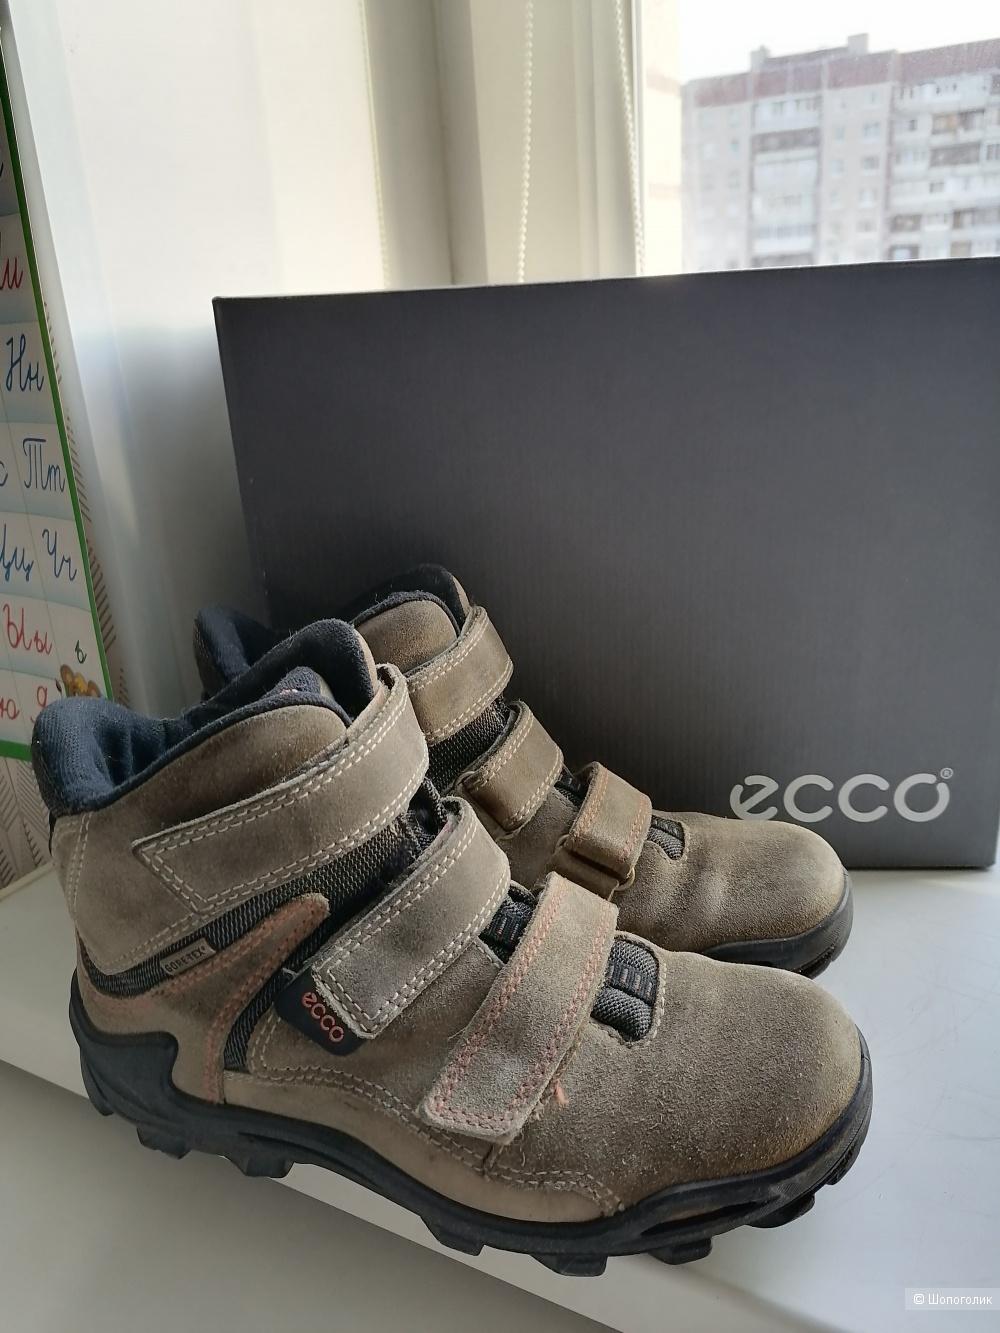 Ботинки Ecco Экко, 36 размер.